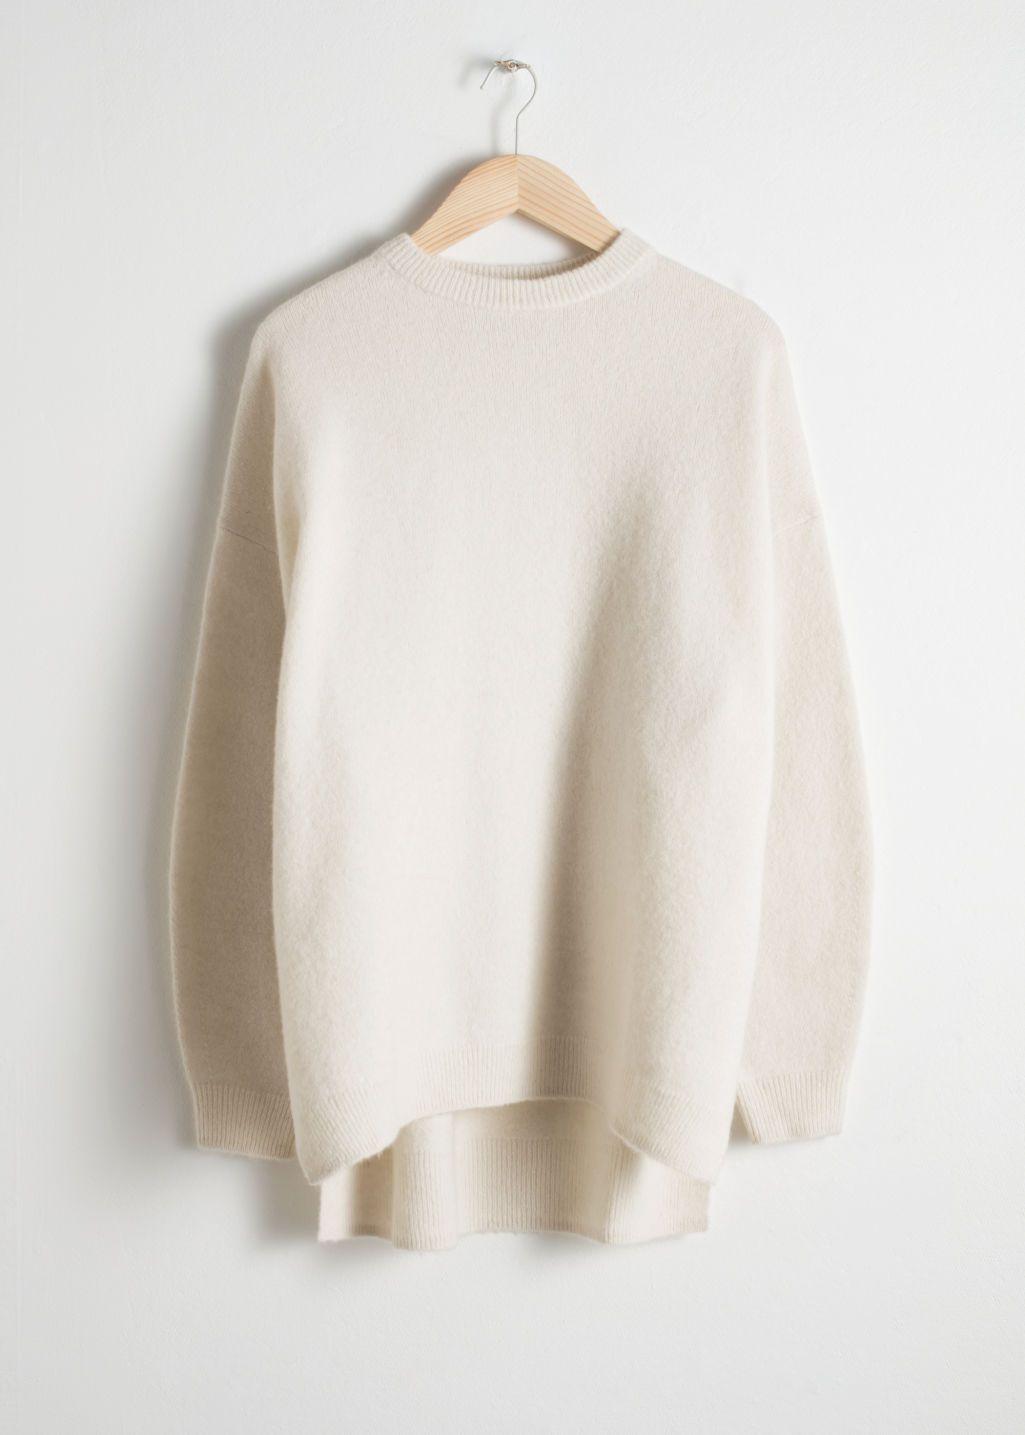 Oversized Wool Blend Sweater | Sweaters, Fashion, Cashmere